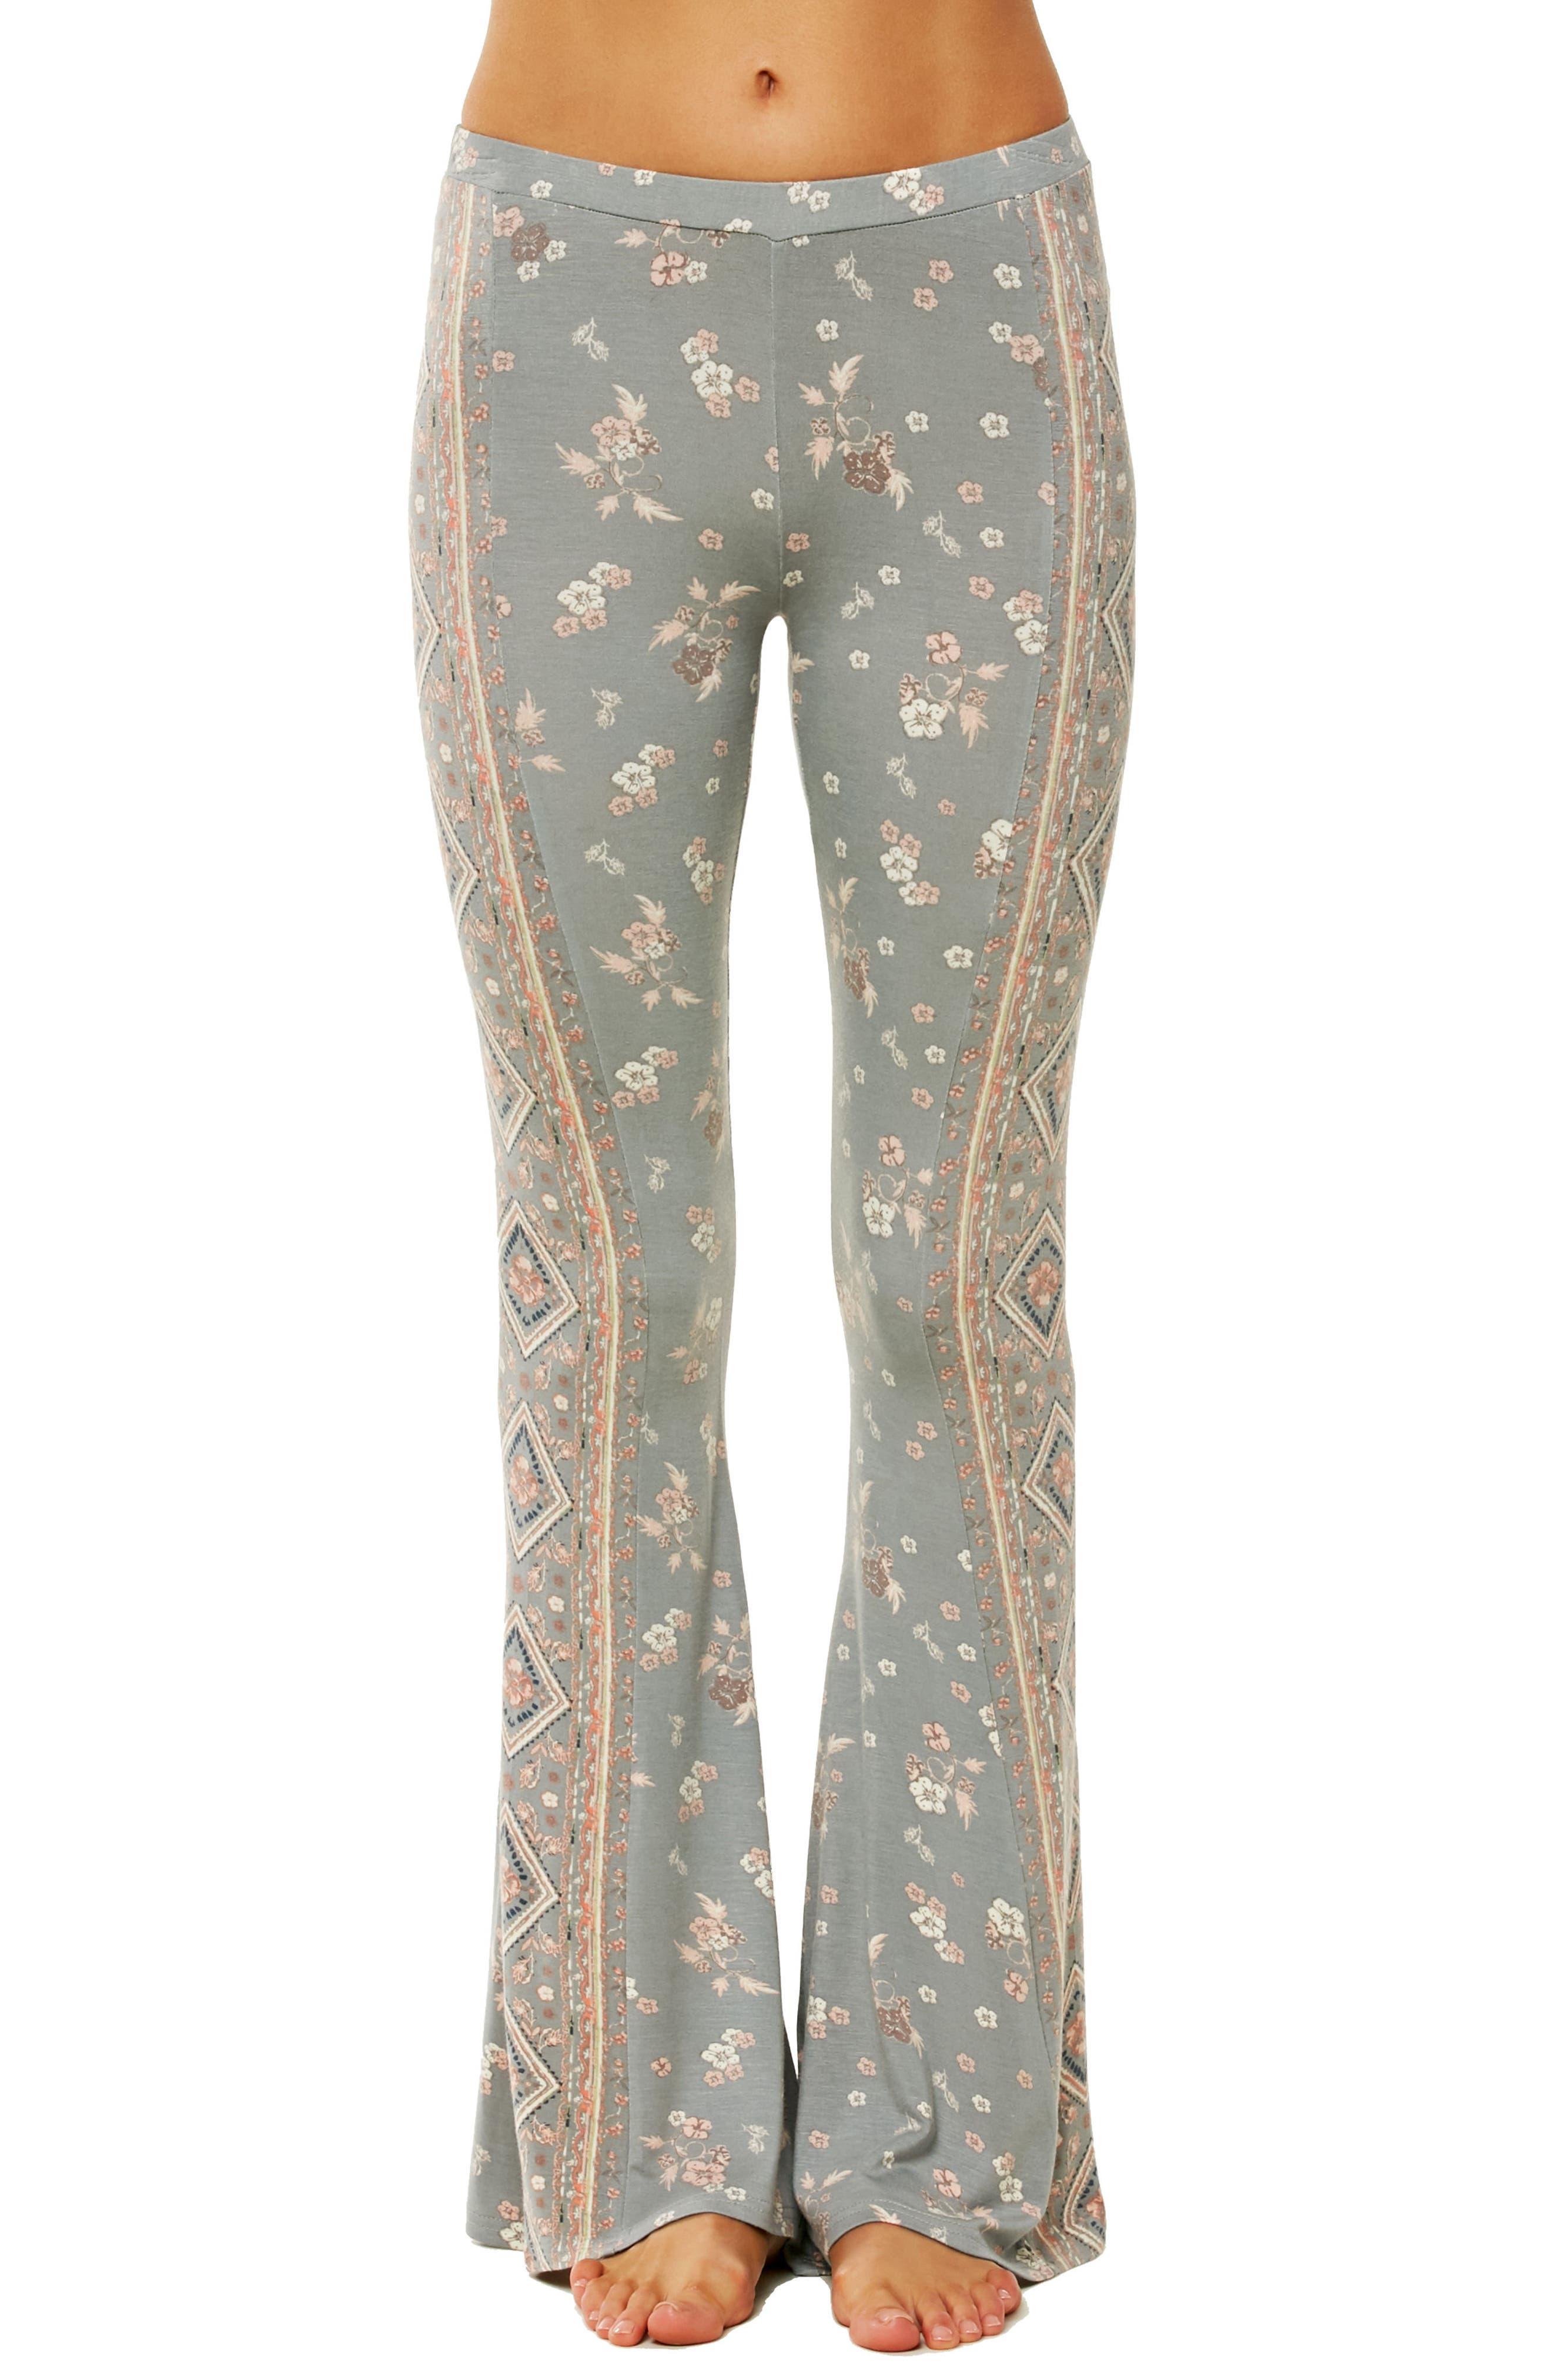 Kelli Knit Flare Pants,                             Main thumbnail 1, color,                             Neutral Gray - Fog